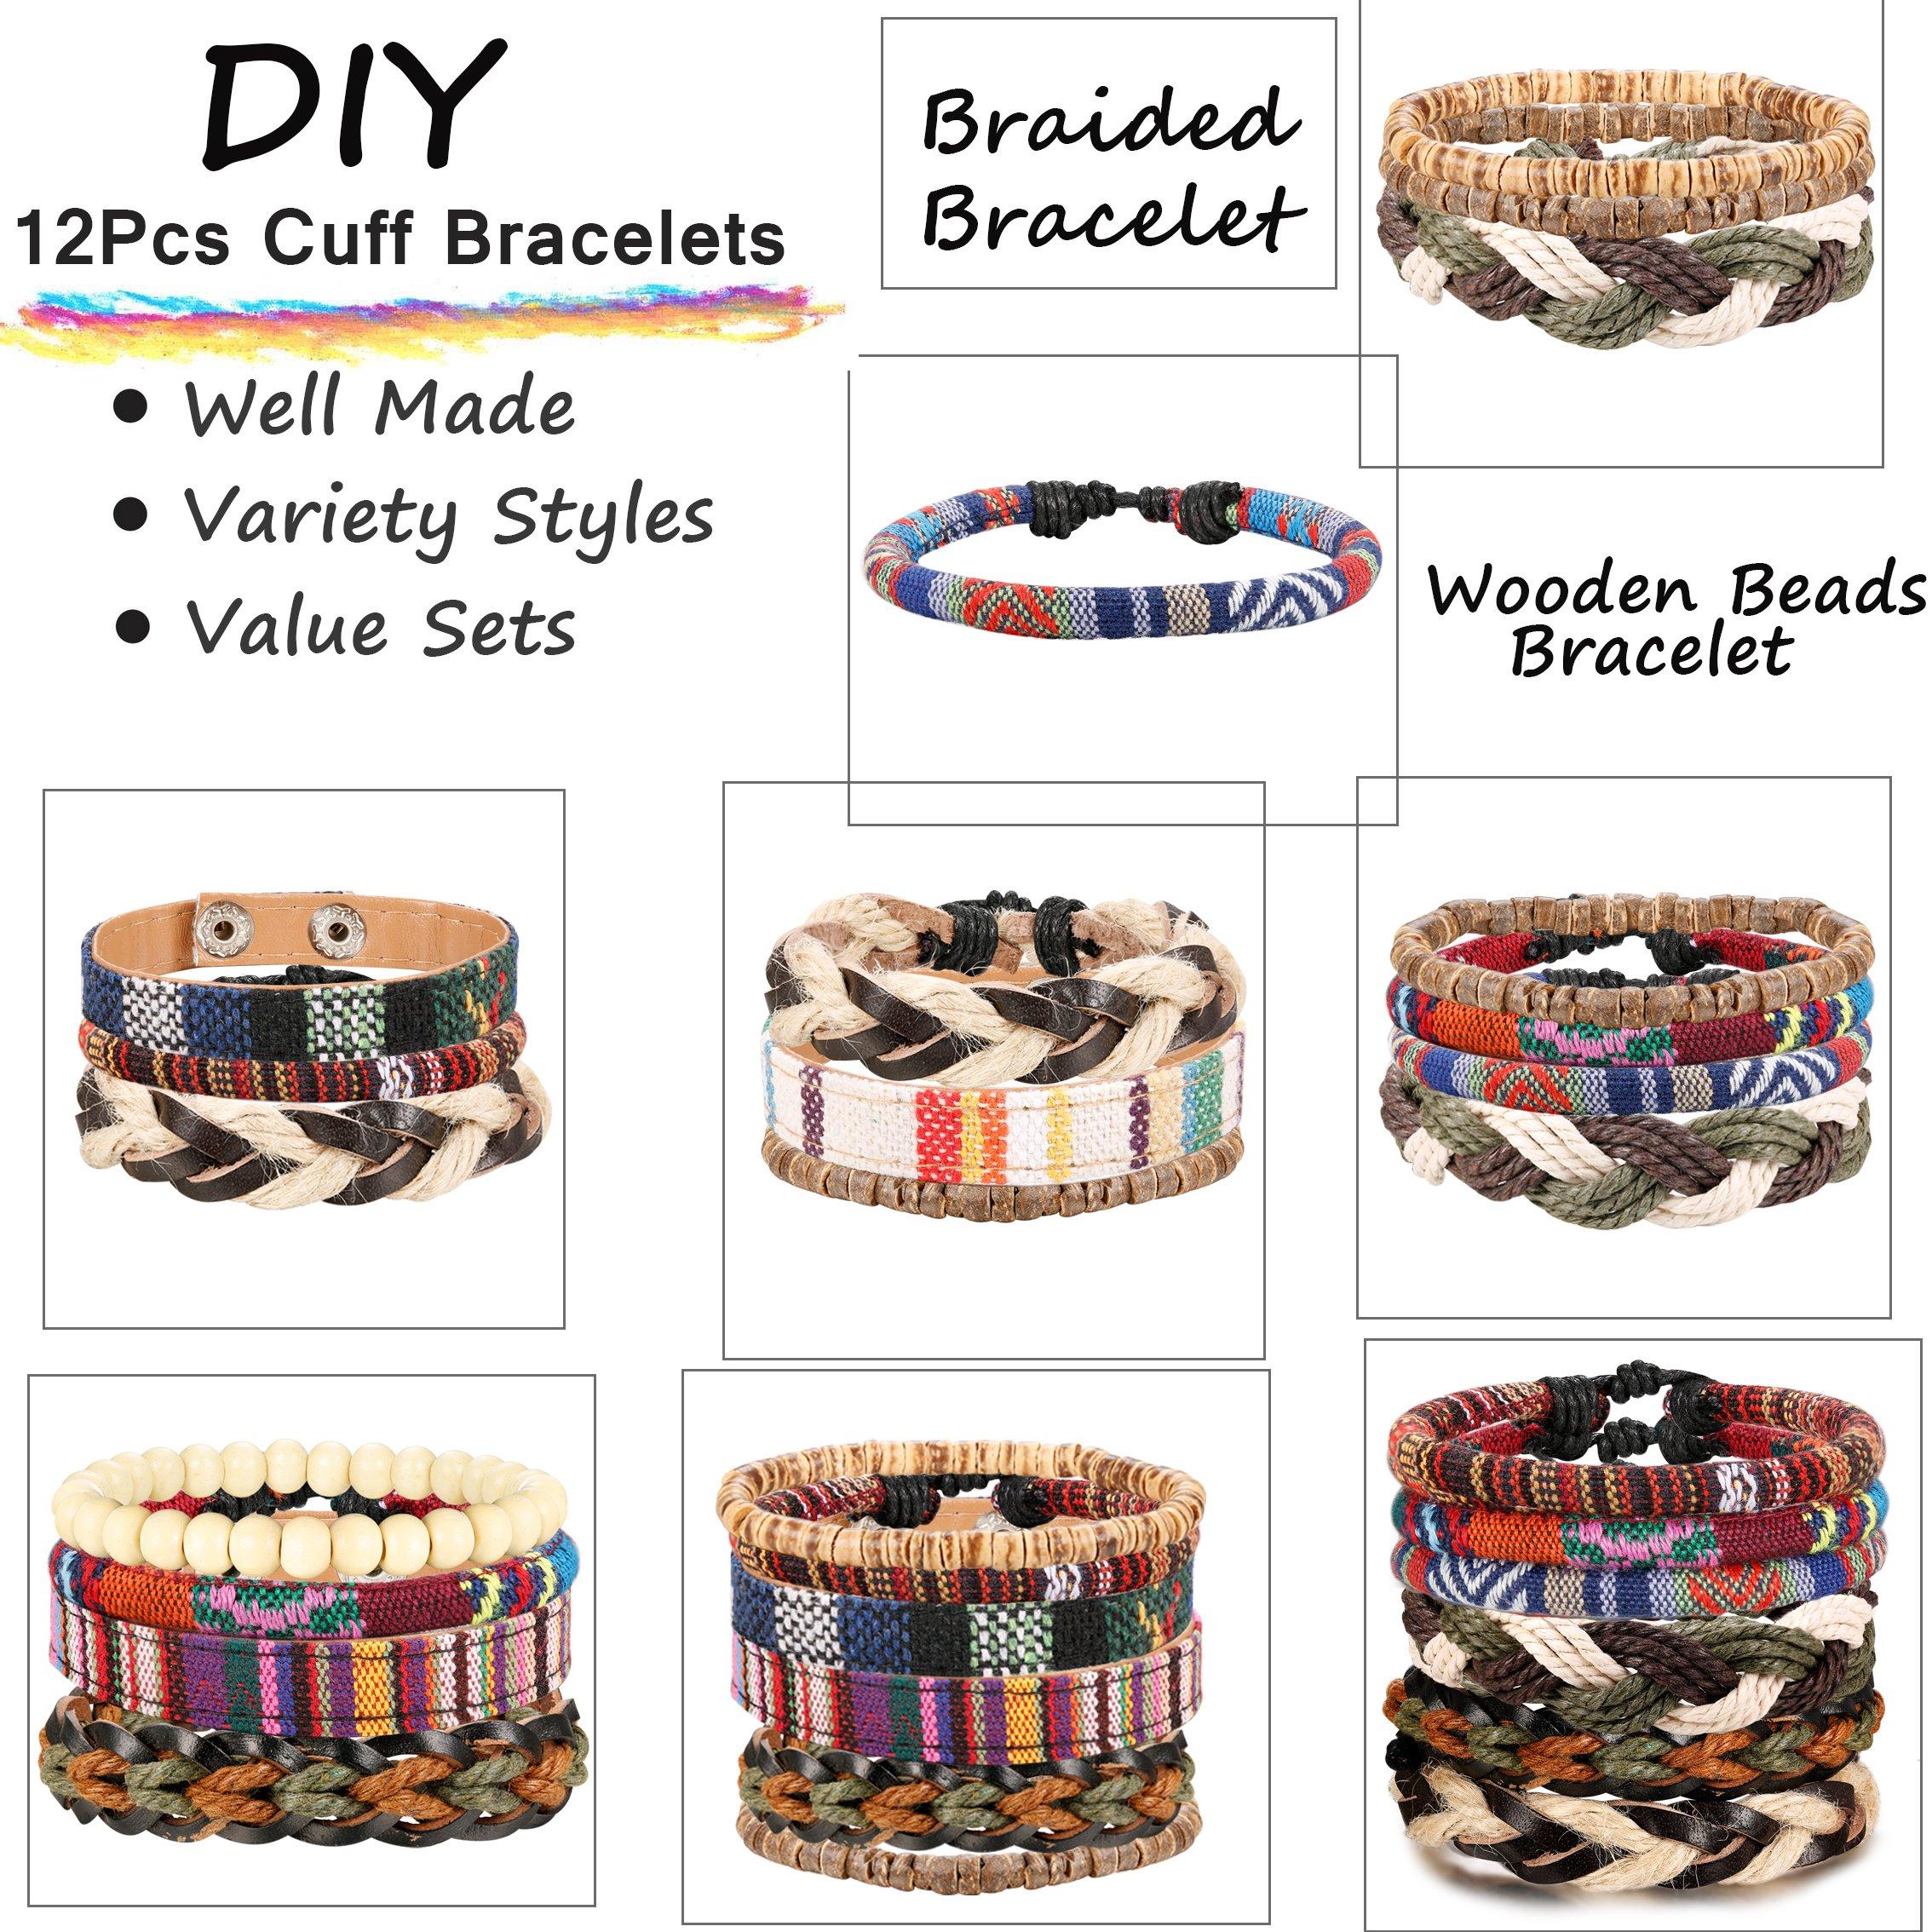 Jstyle 6-12Pcs Wrap Bracelets for Women Men Hemp Cords Ethnic Tribal Bracelet Wooden Beads Leather Bracelets Wristbands by Jstyle (Image #7)